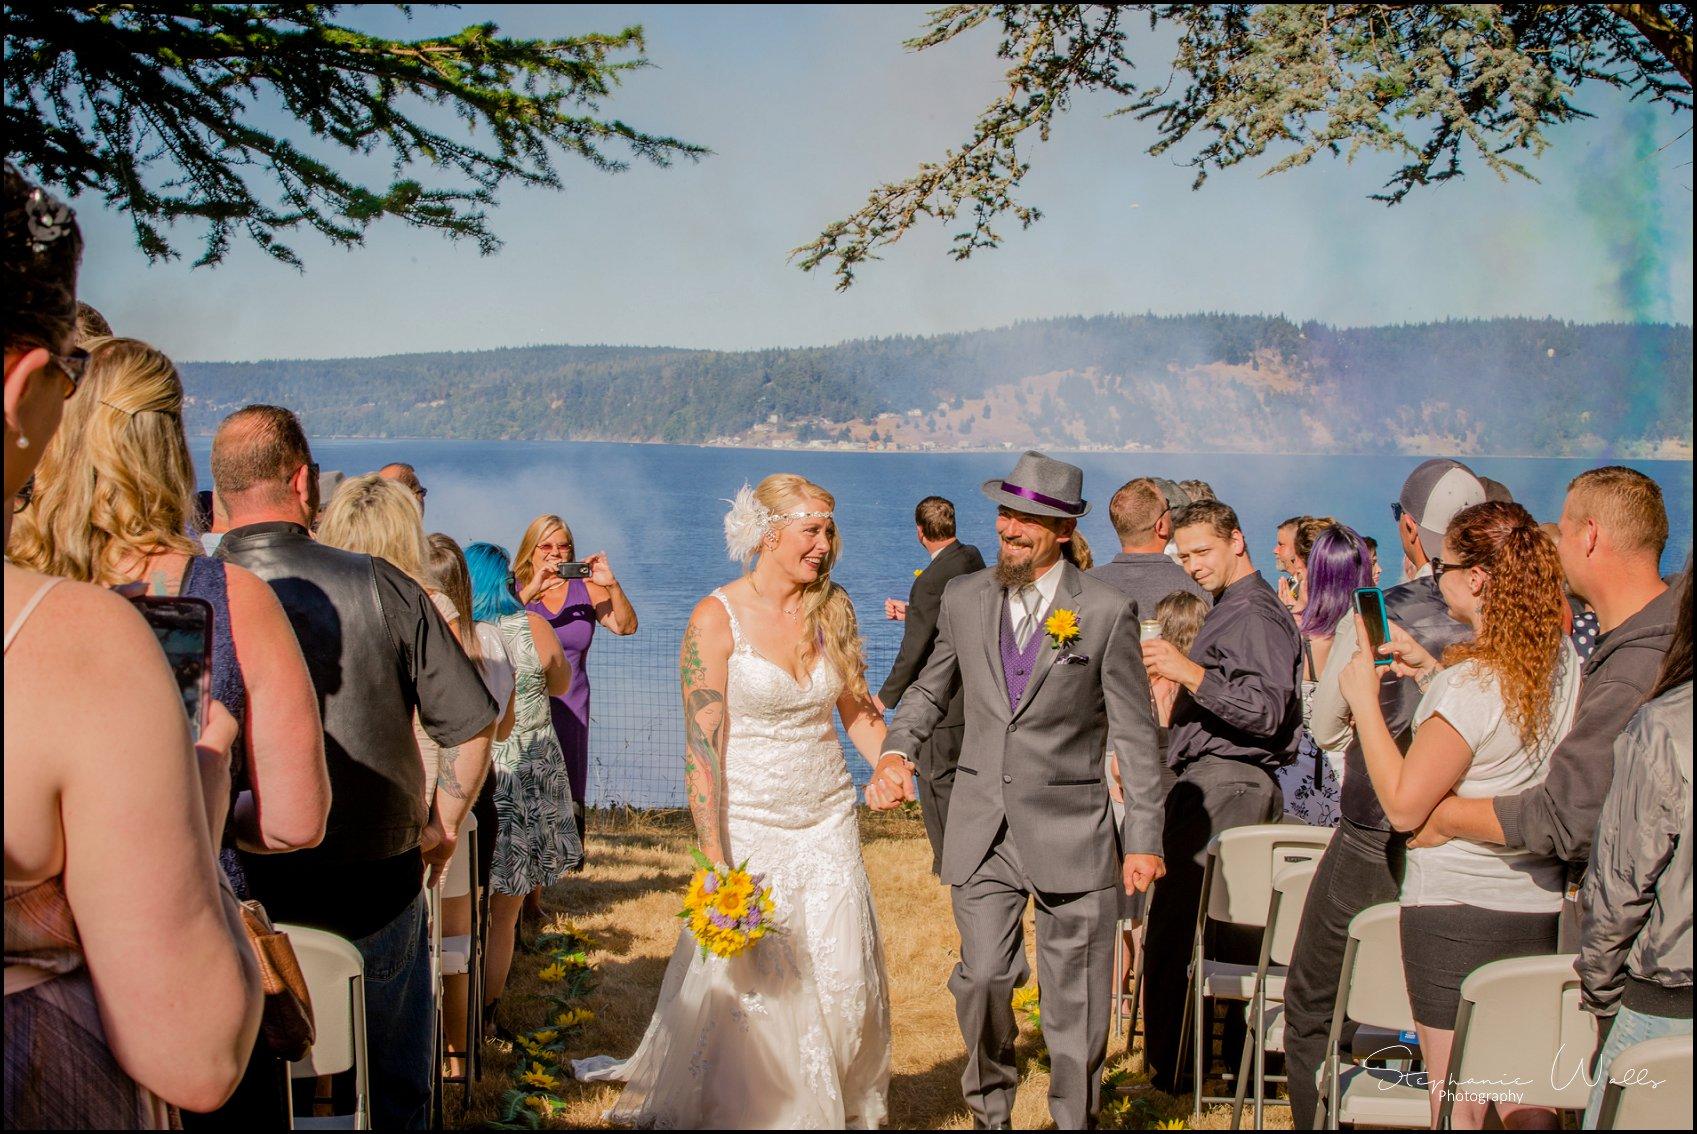 Everist Wedding 283 Patti & Bobbys | Troll Haven Castle & Bandy Farms | Sequim, Wa Wedding Photographer